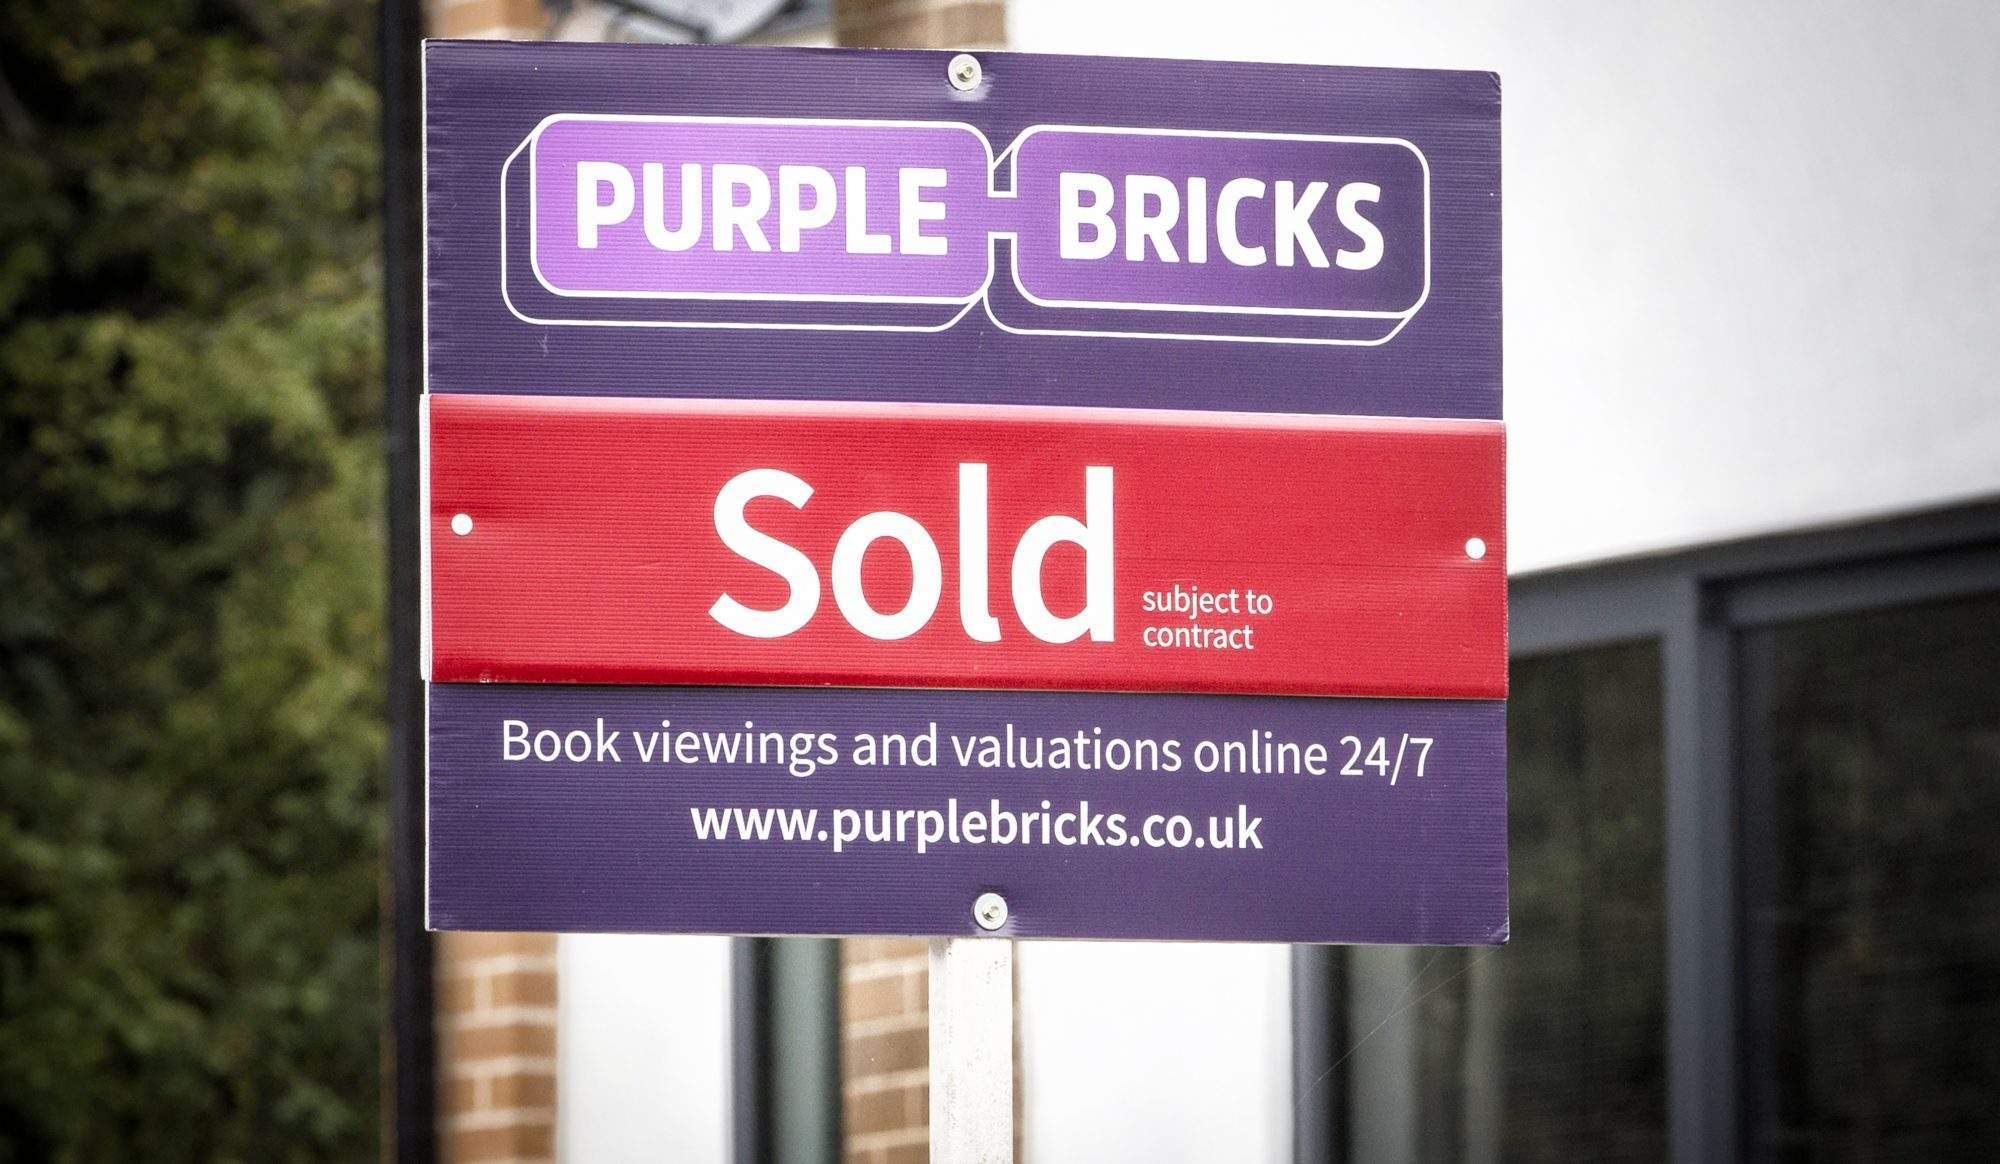 Purplebricks share price: Supply slump or cracks in the foundations?